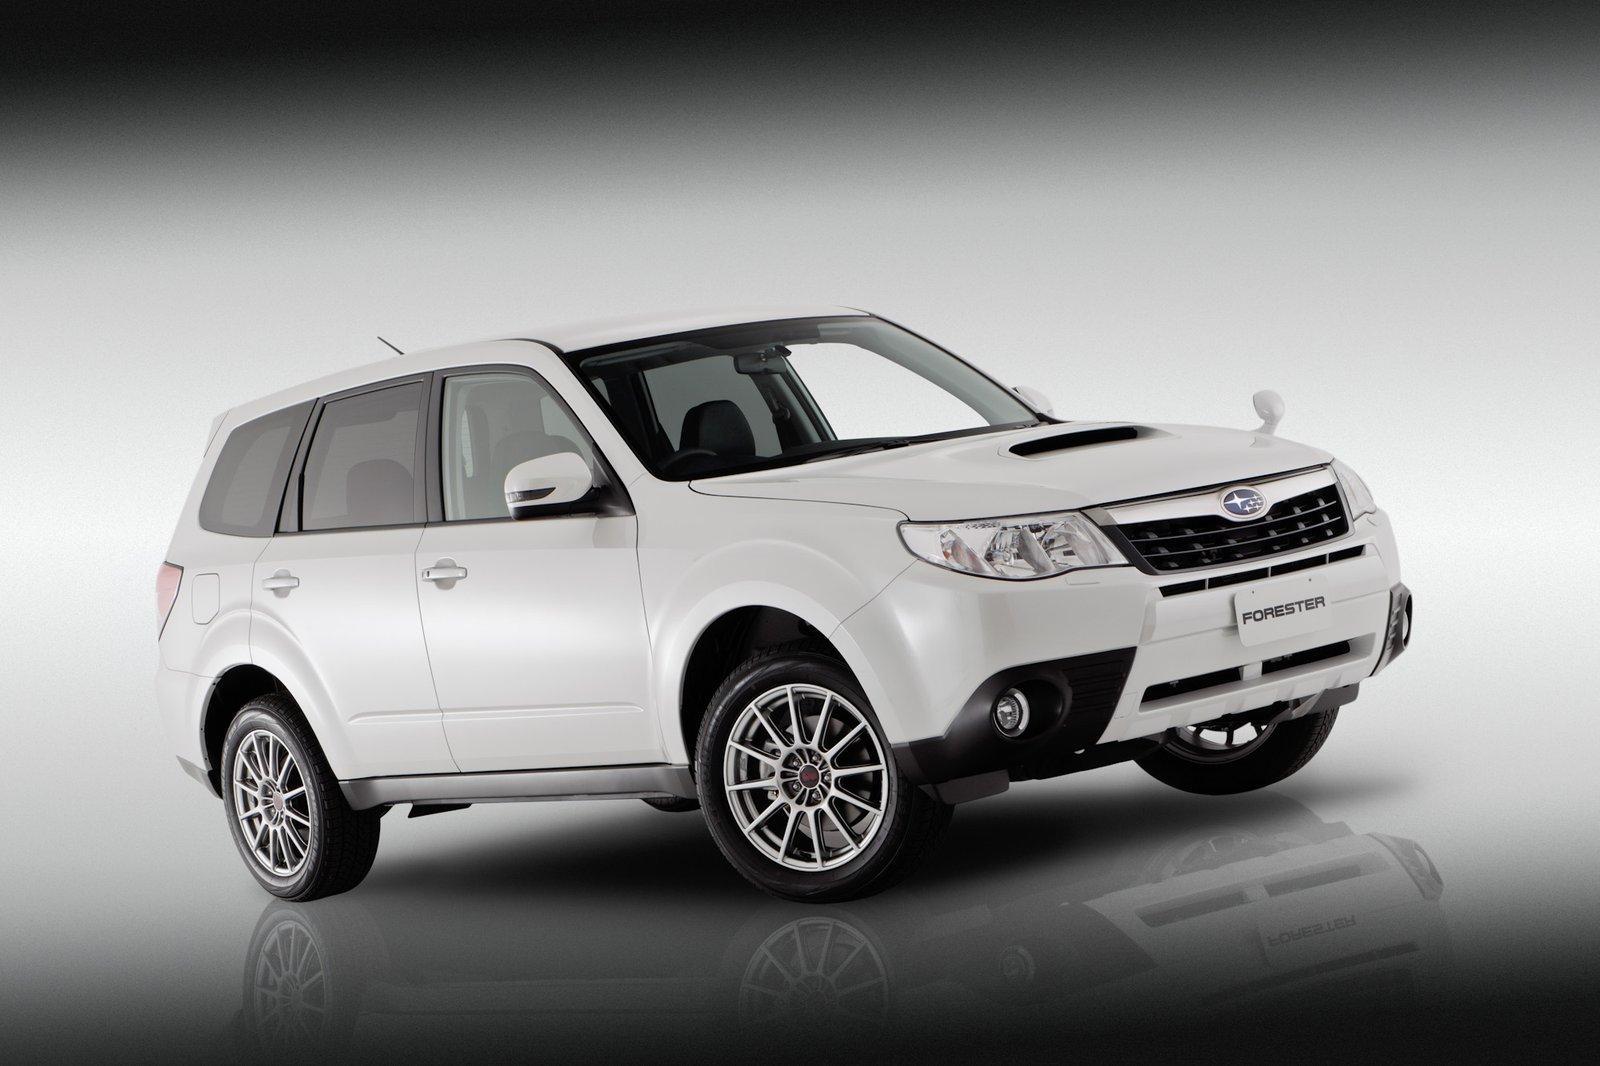 Subaru Forester S Edition At The Australian International